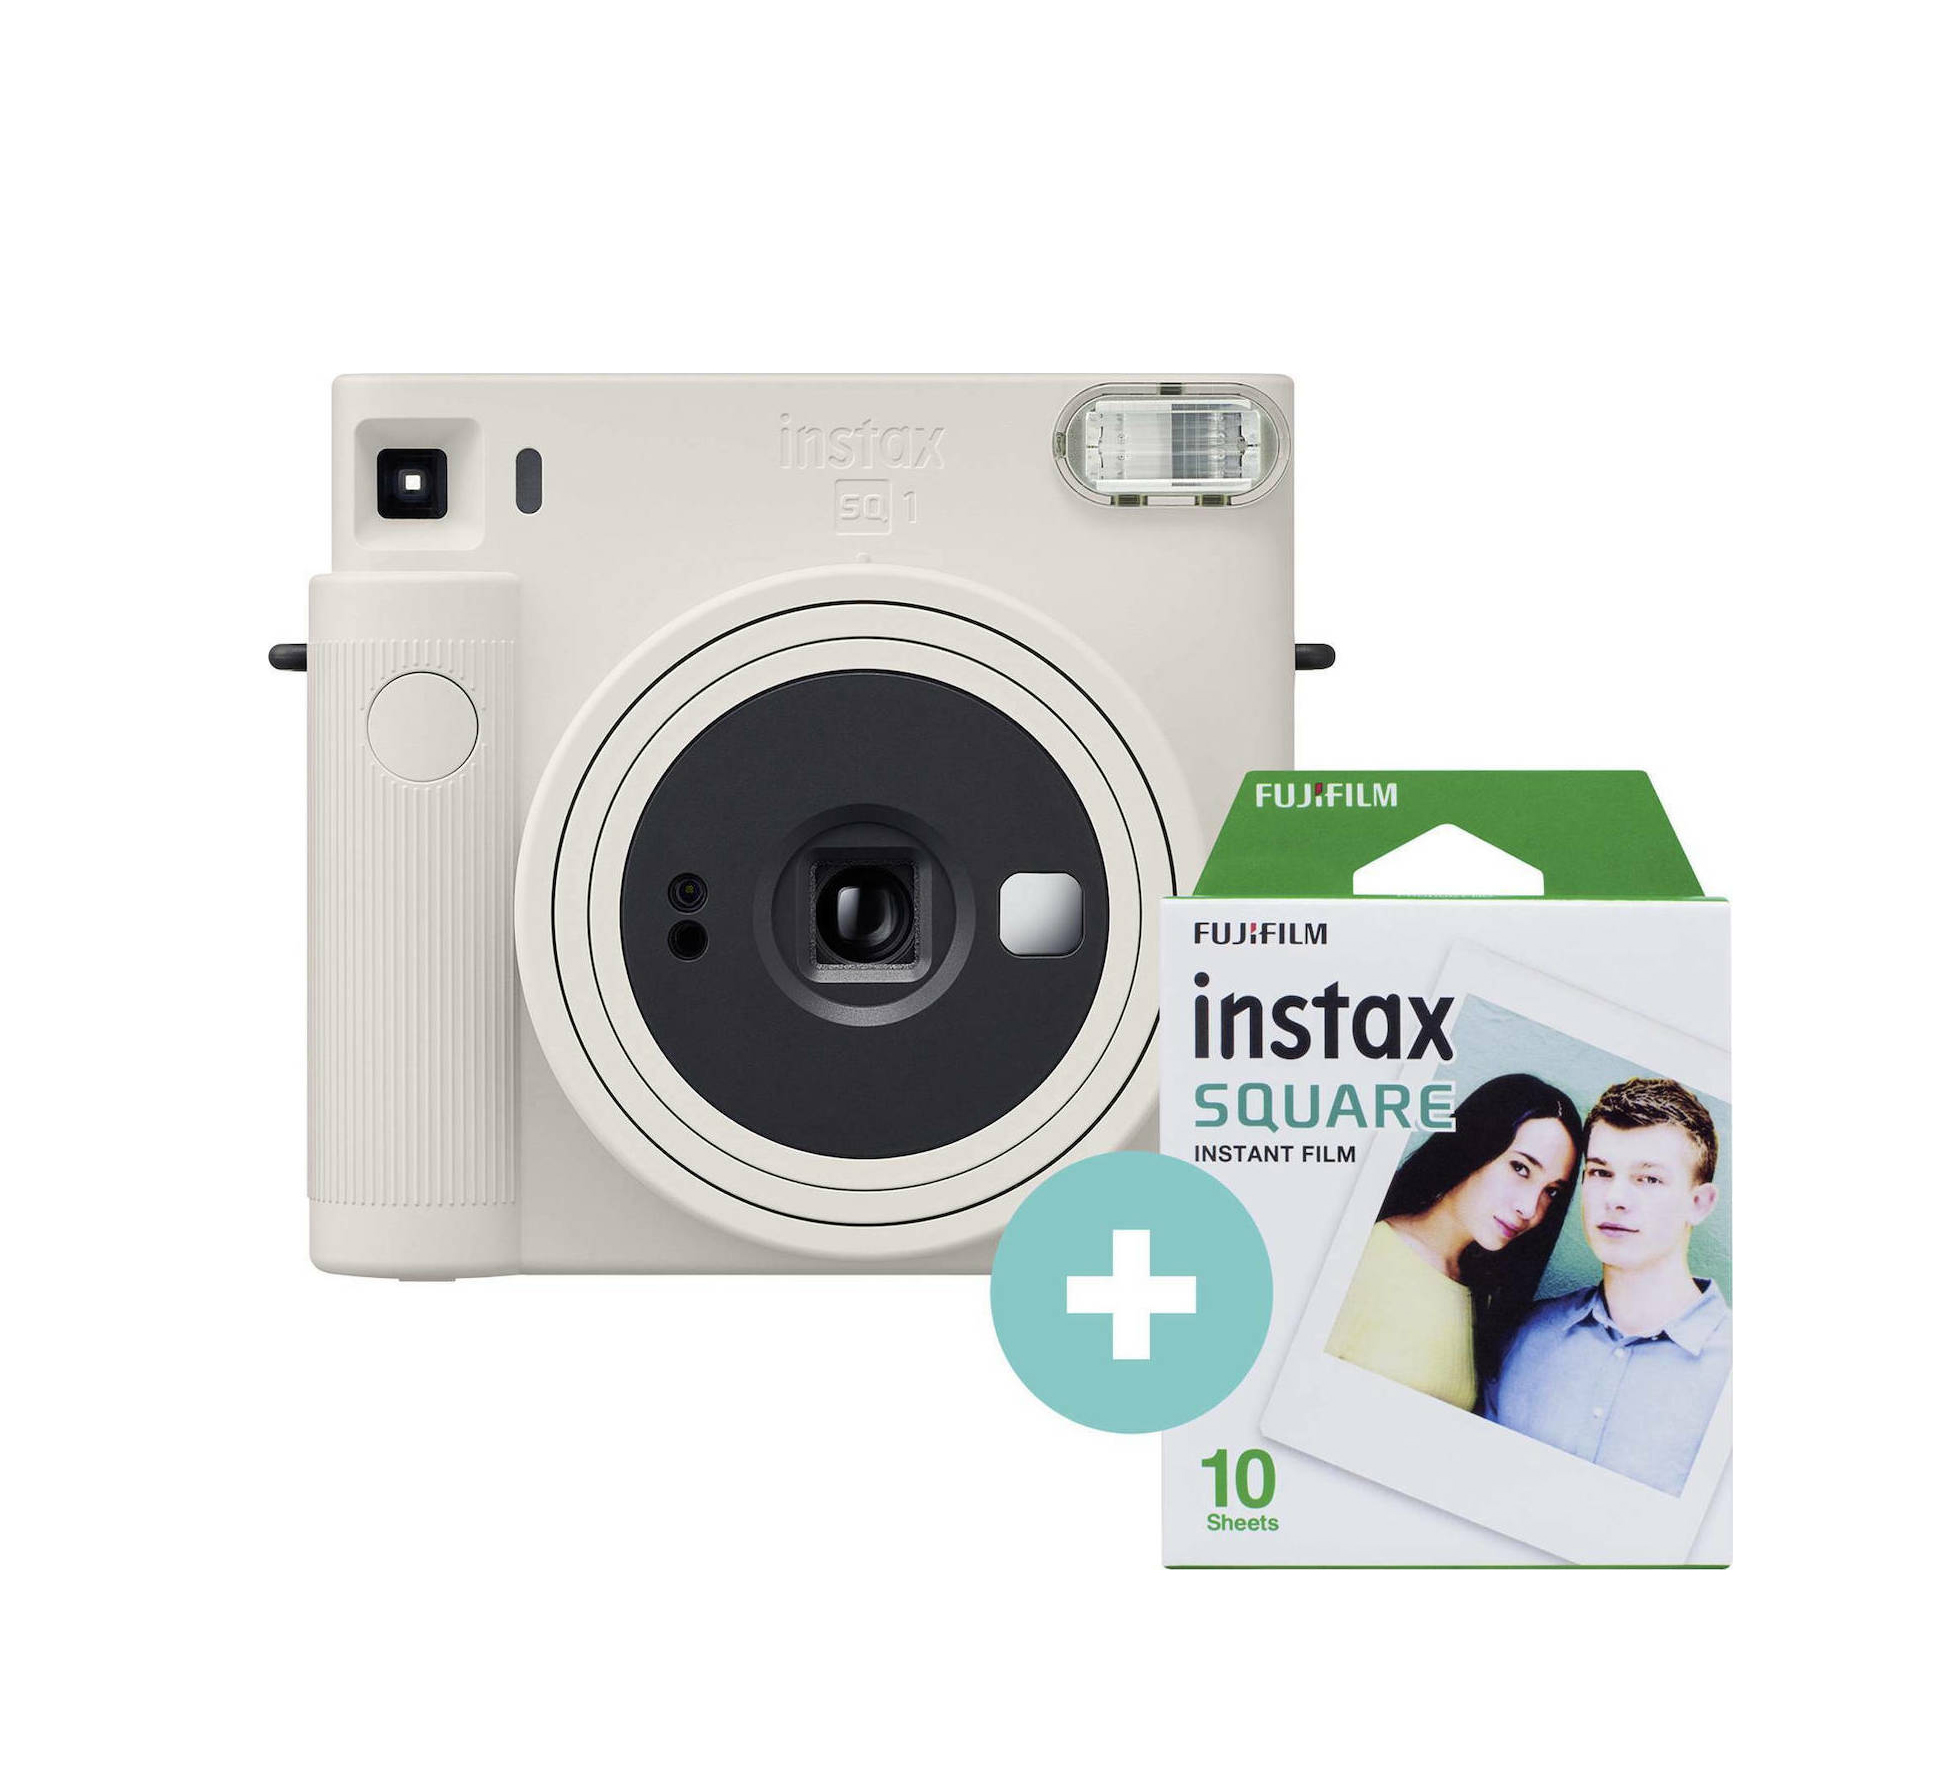 Fujifilm Instax Square SQ 1 Set Chalk White Αναλογική Φωτογραφική Μηχανή 70100148677